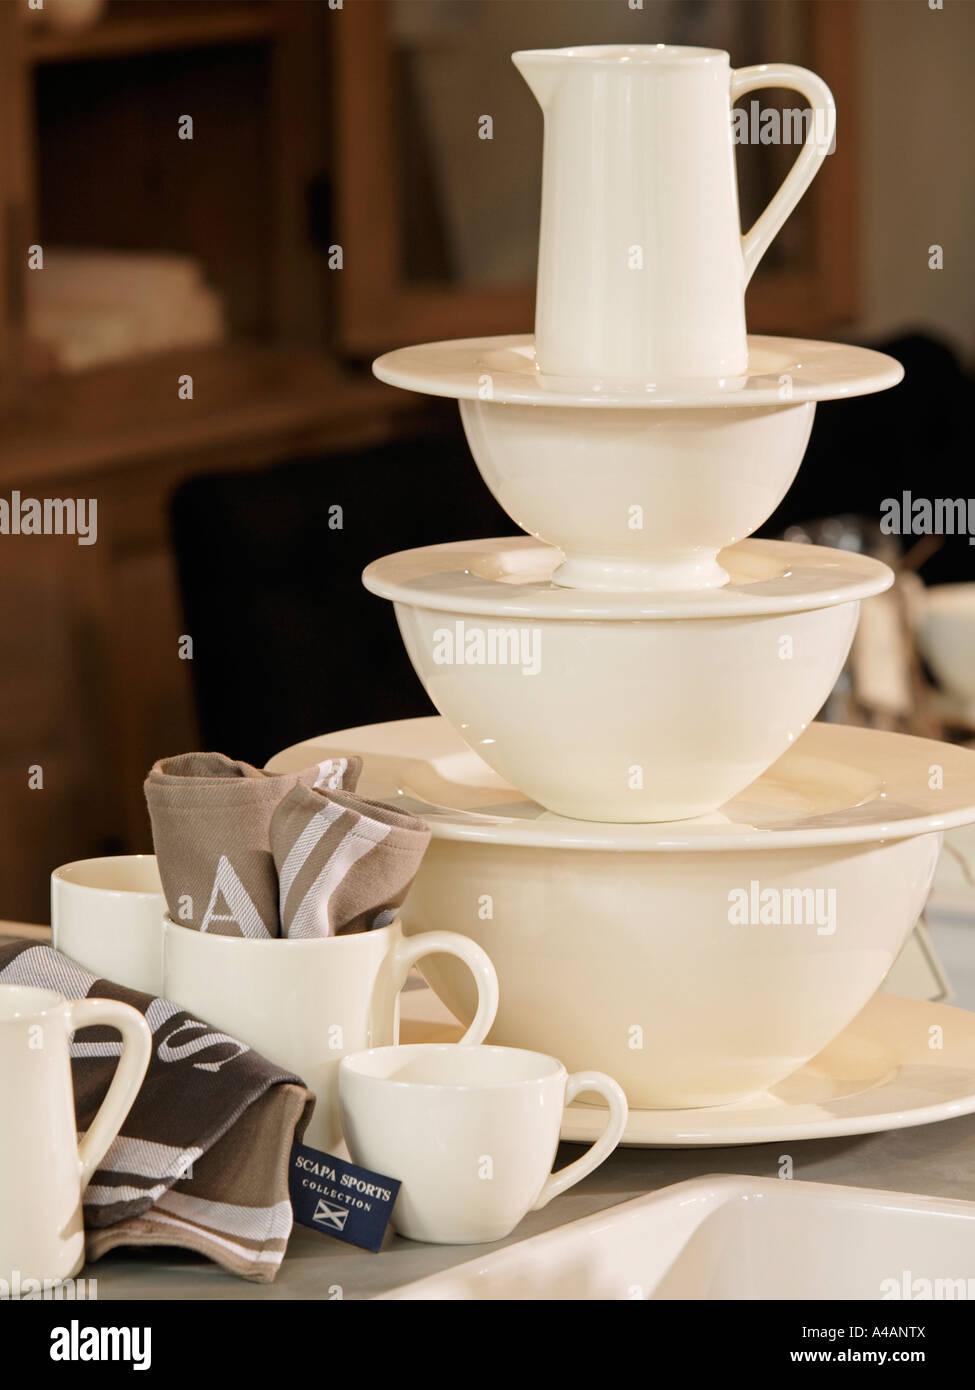 Luxury Products Stockfotos & Luxury Products Bilder - Alamy